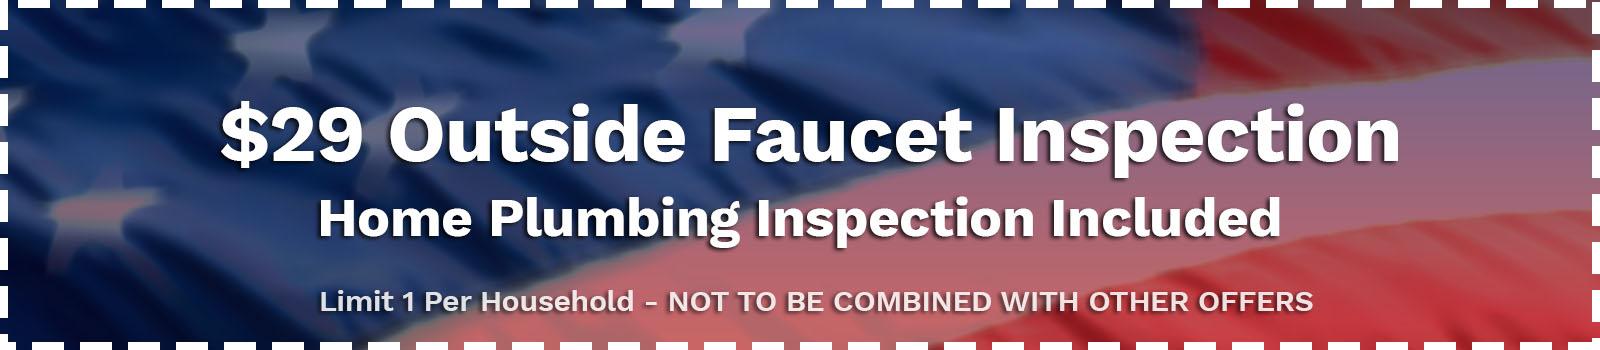 Freedom Plumbers Discounts Specials Fairfax Virginia